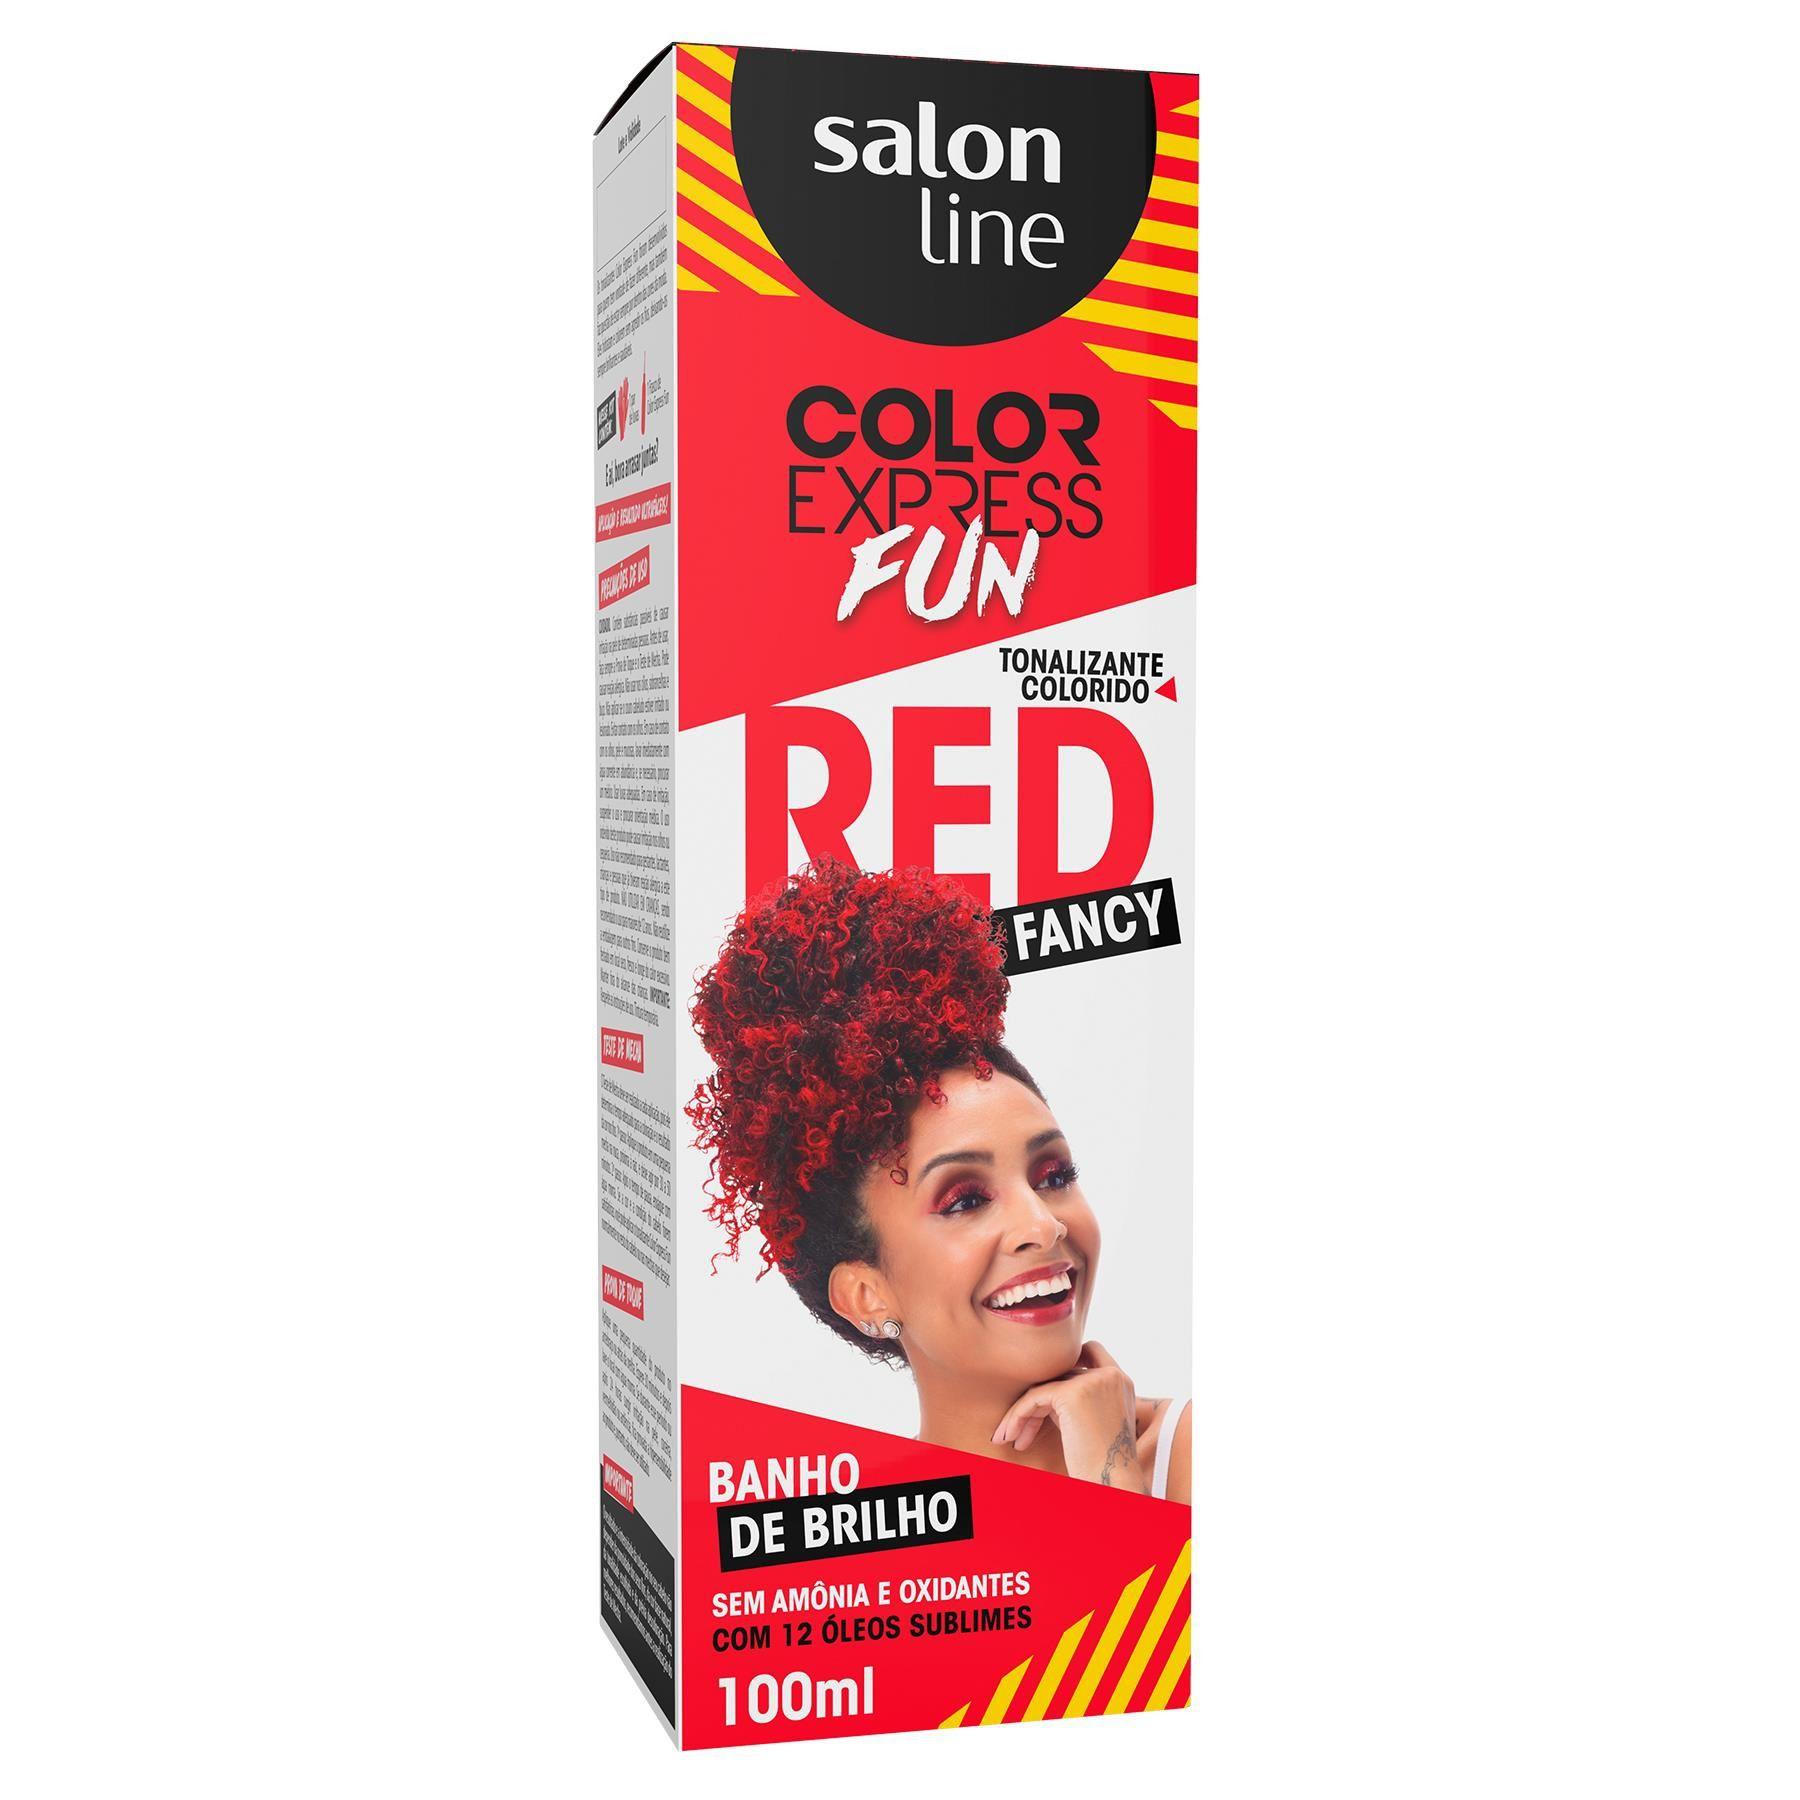 Tonalizante Salon Line Color Express Fun Red Fancy 100ml